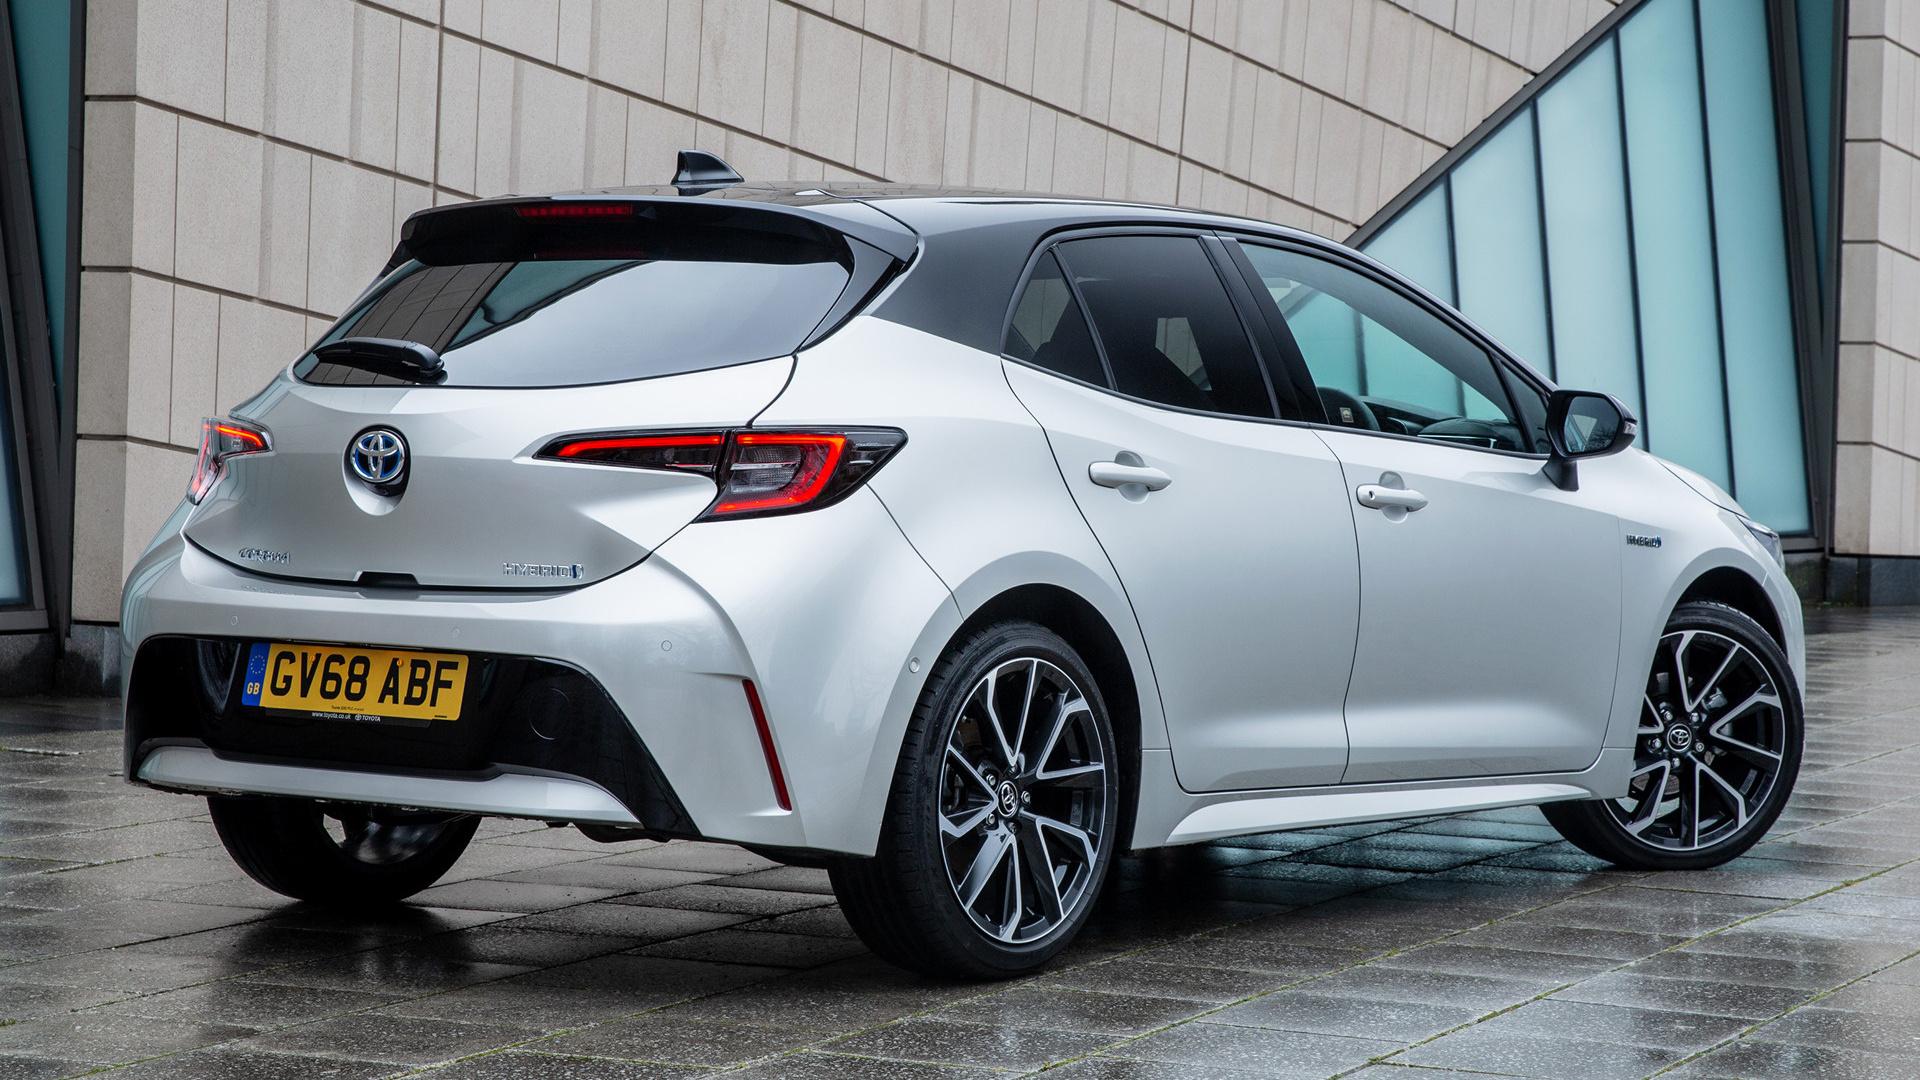 2019 Toyota Corolla Hybrid Uk Fonds D 233 Cran Et Images